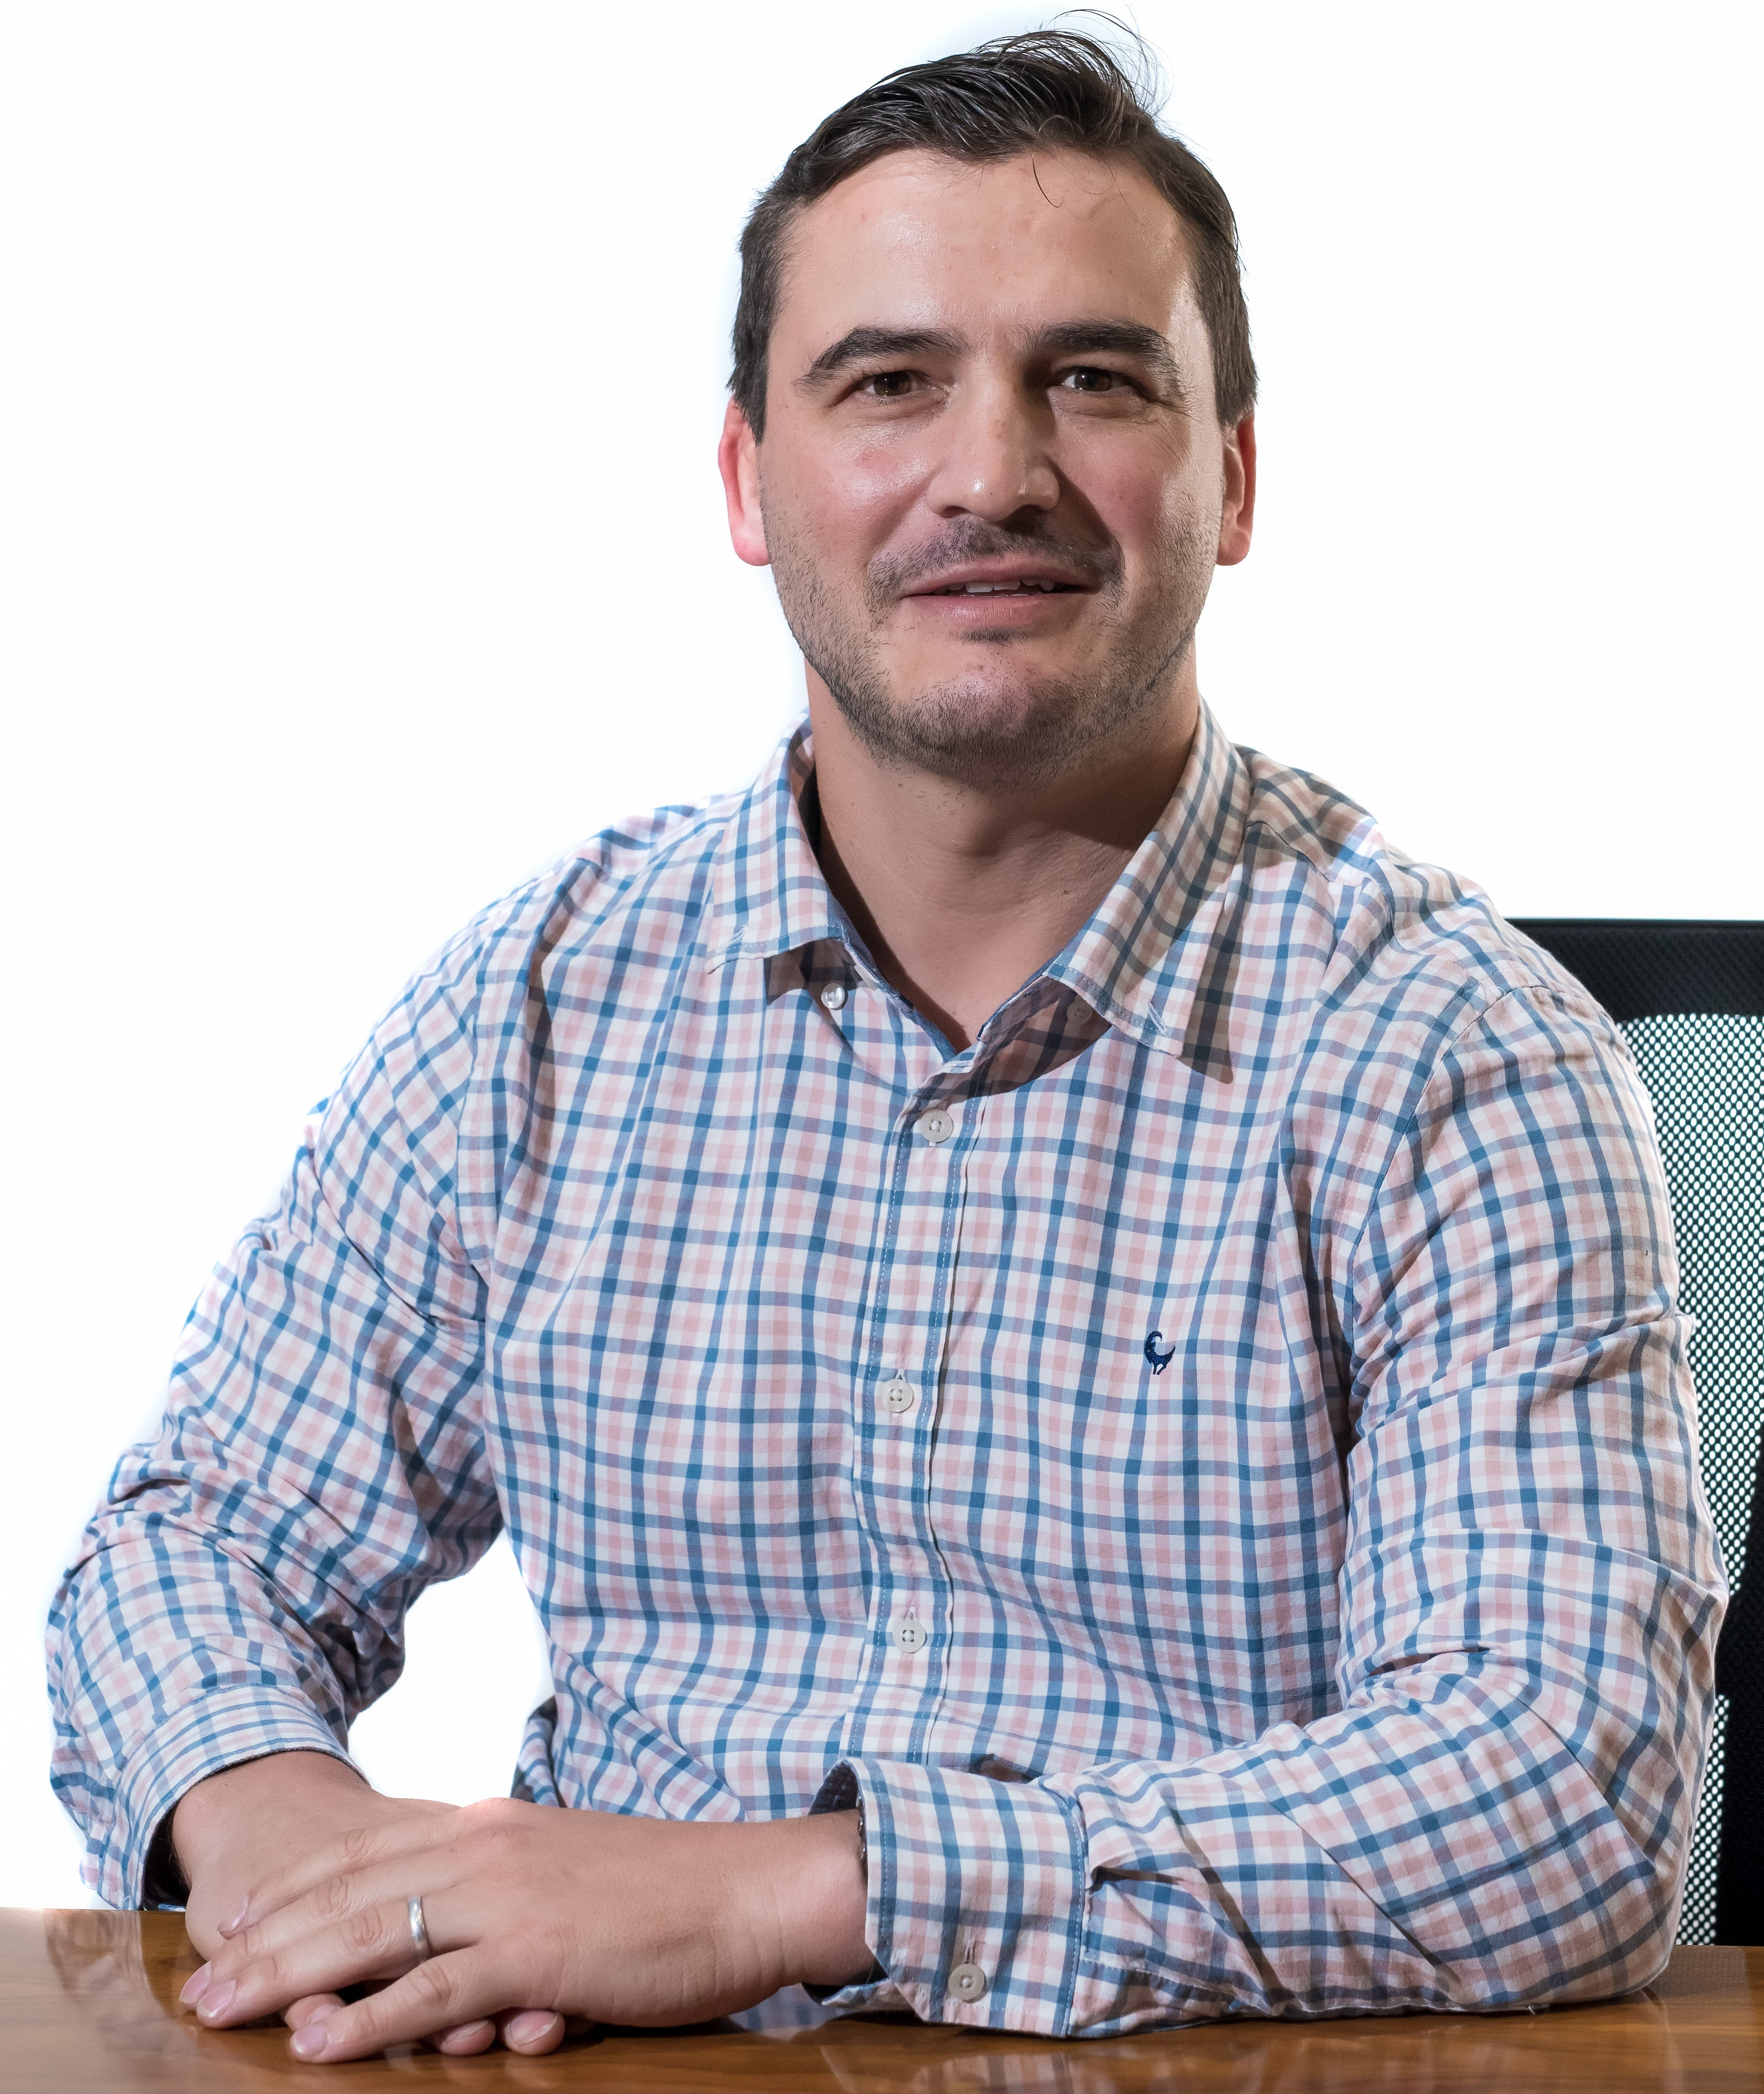 Quentin Mentjies